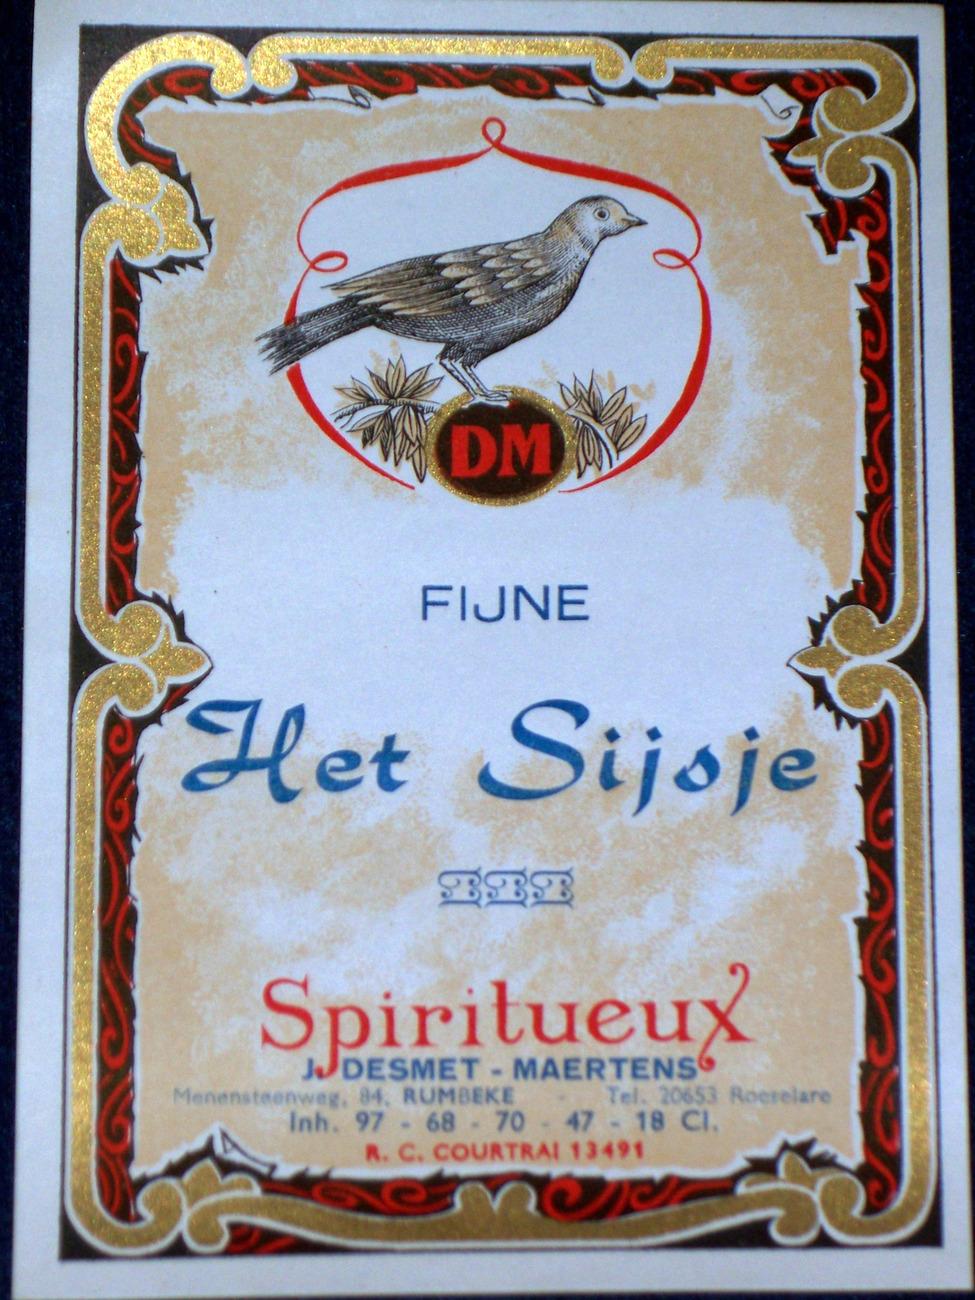 Cute Bird! Fijne Het Sijoje Spiritueux Label, 1930's